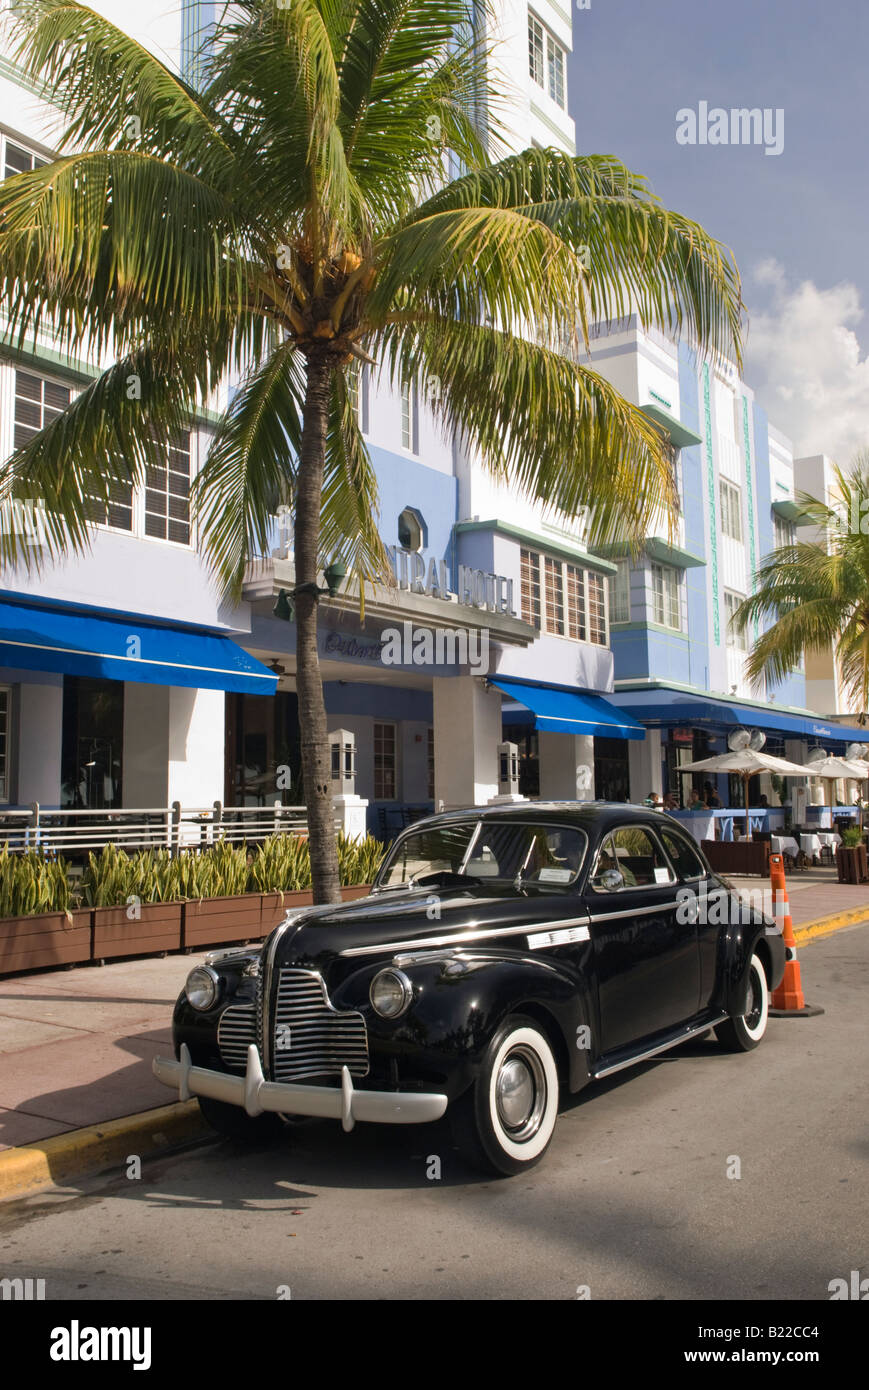 Hotel Marseille Miami South Beach